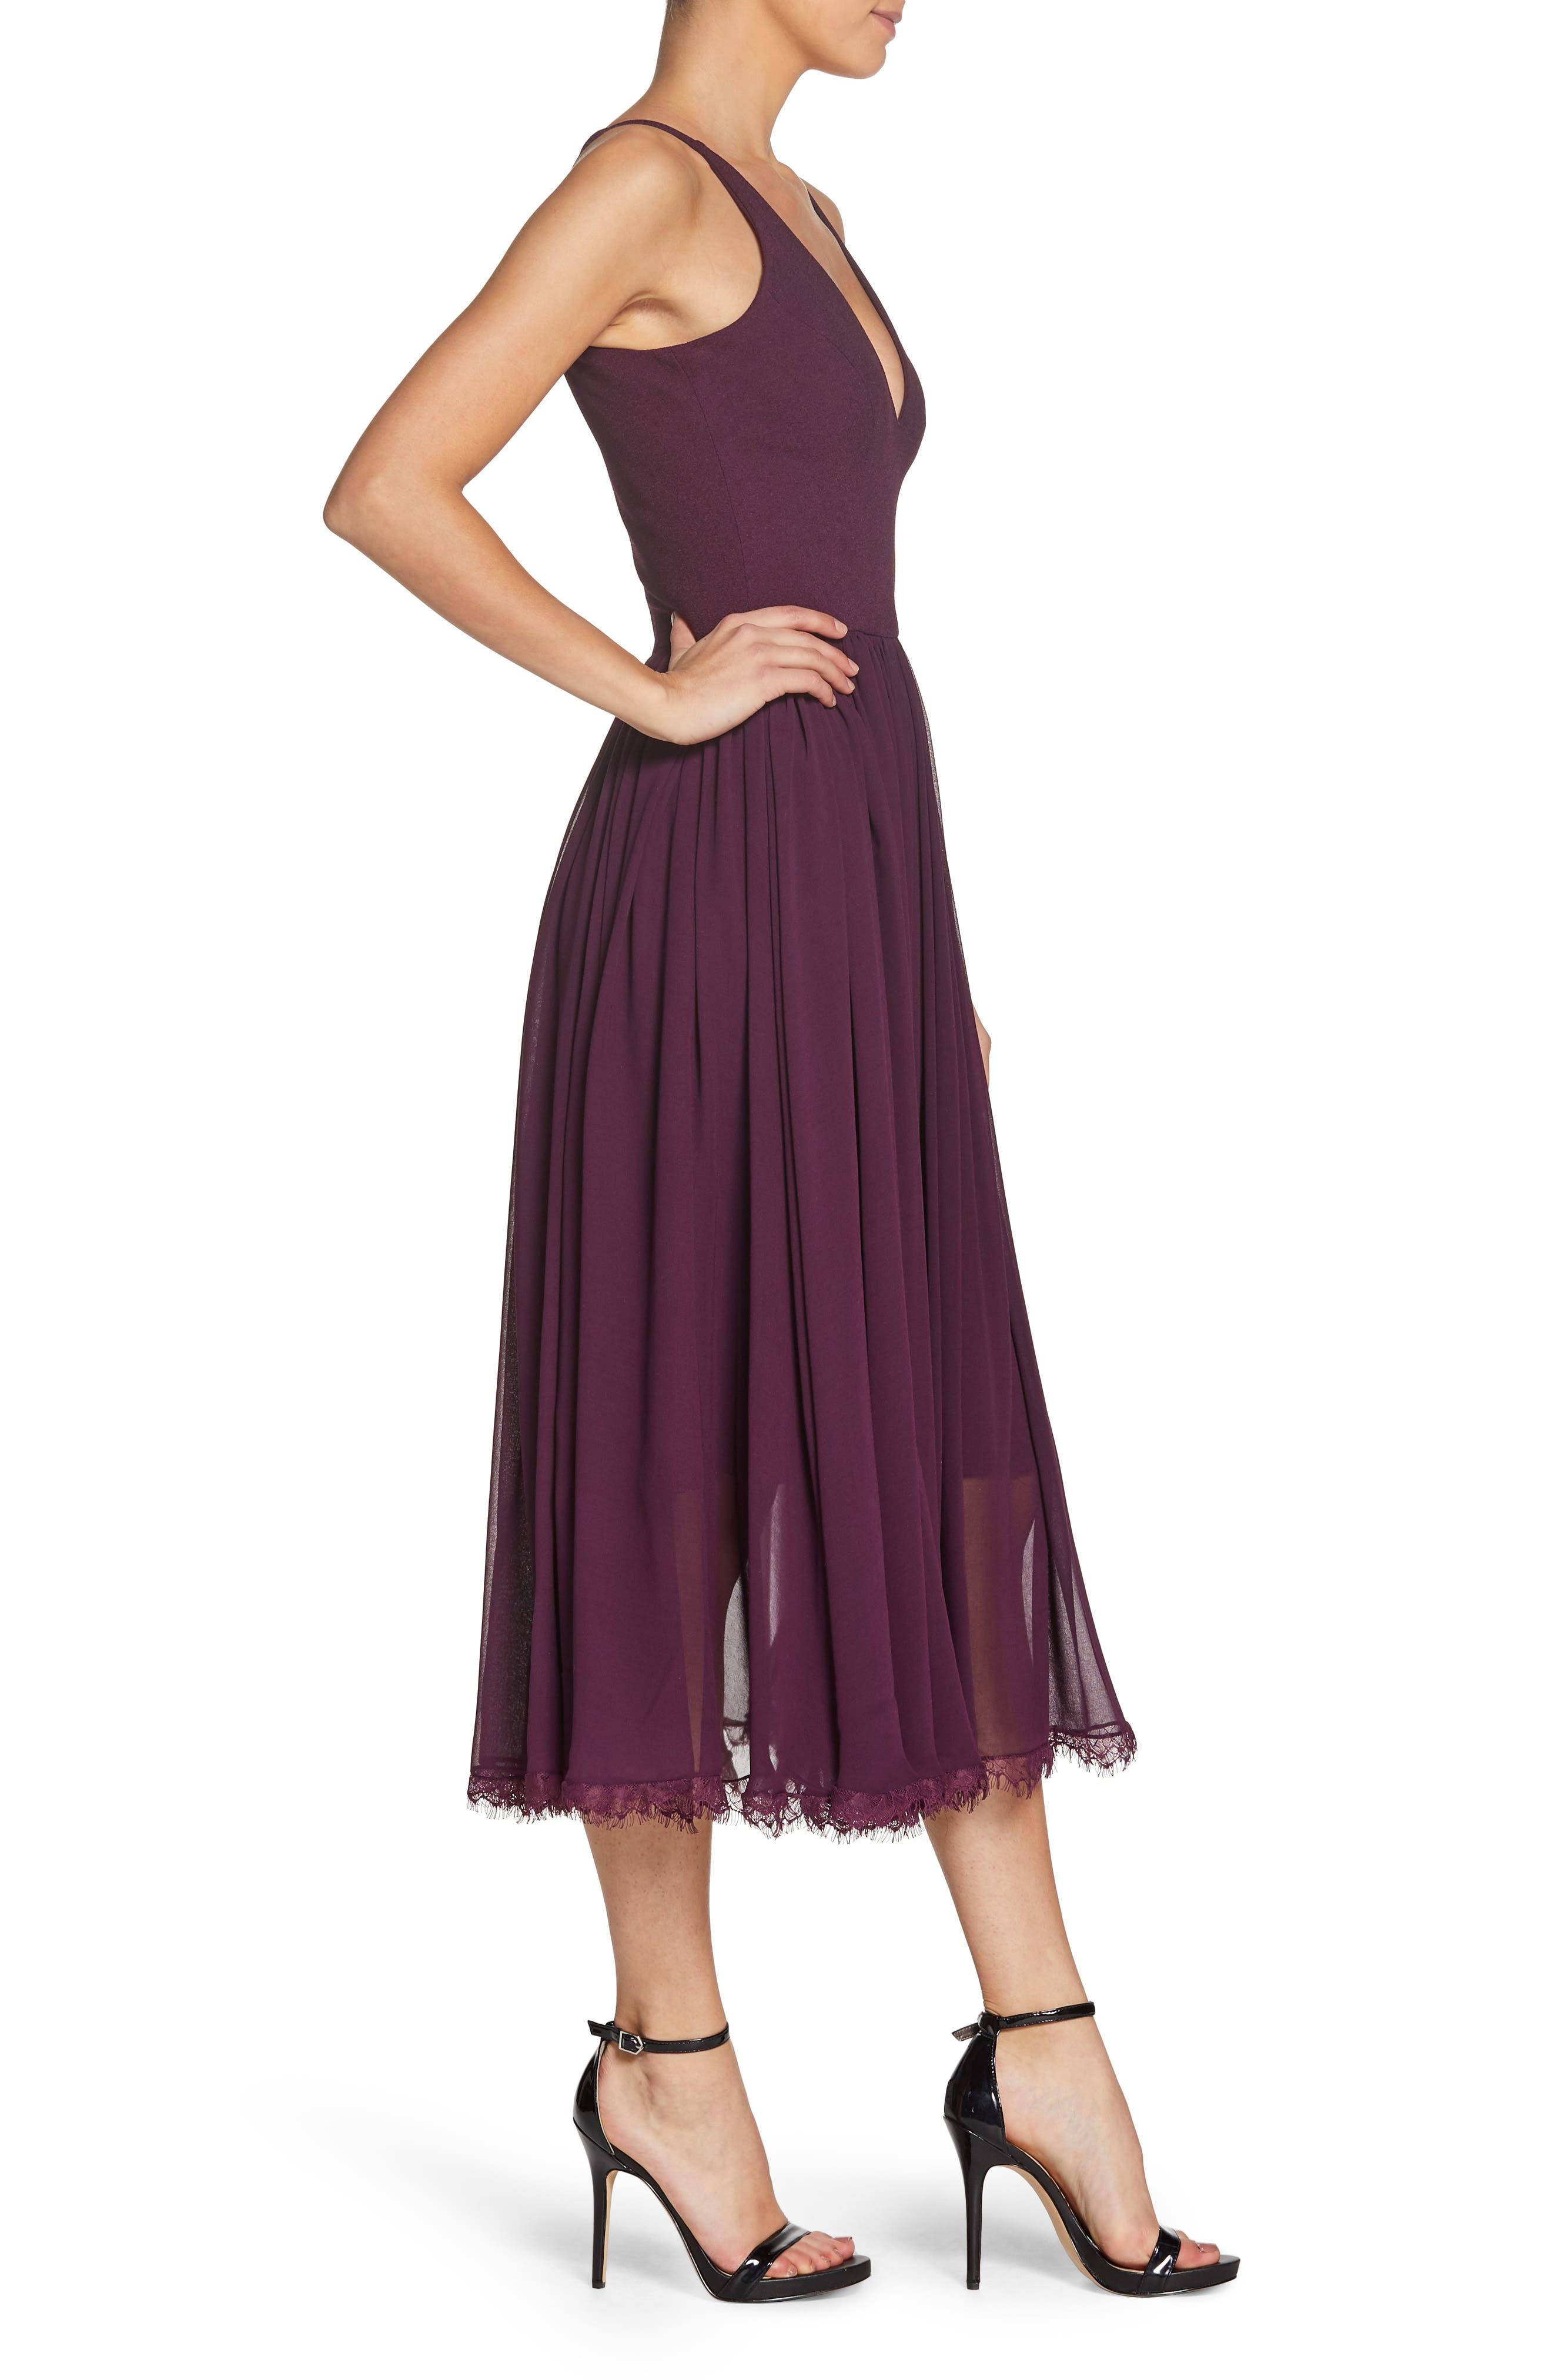 Alicia Mixed Media Midi Dress,                             Alternate thumbnail 3, color,                             PLUM